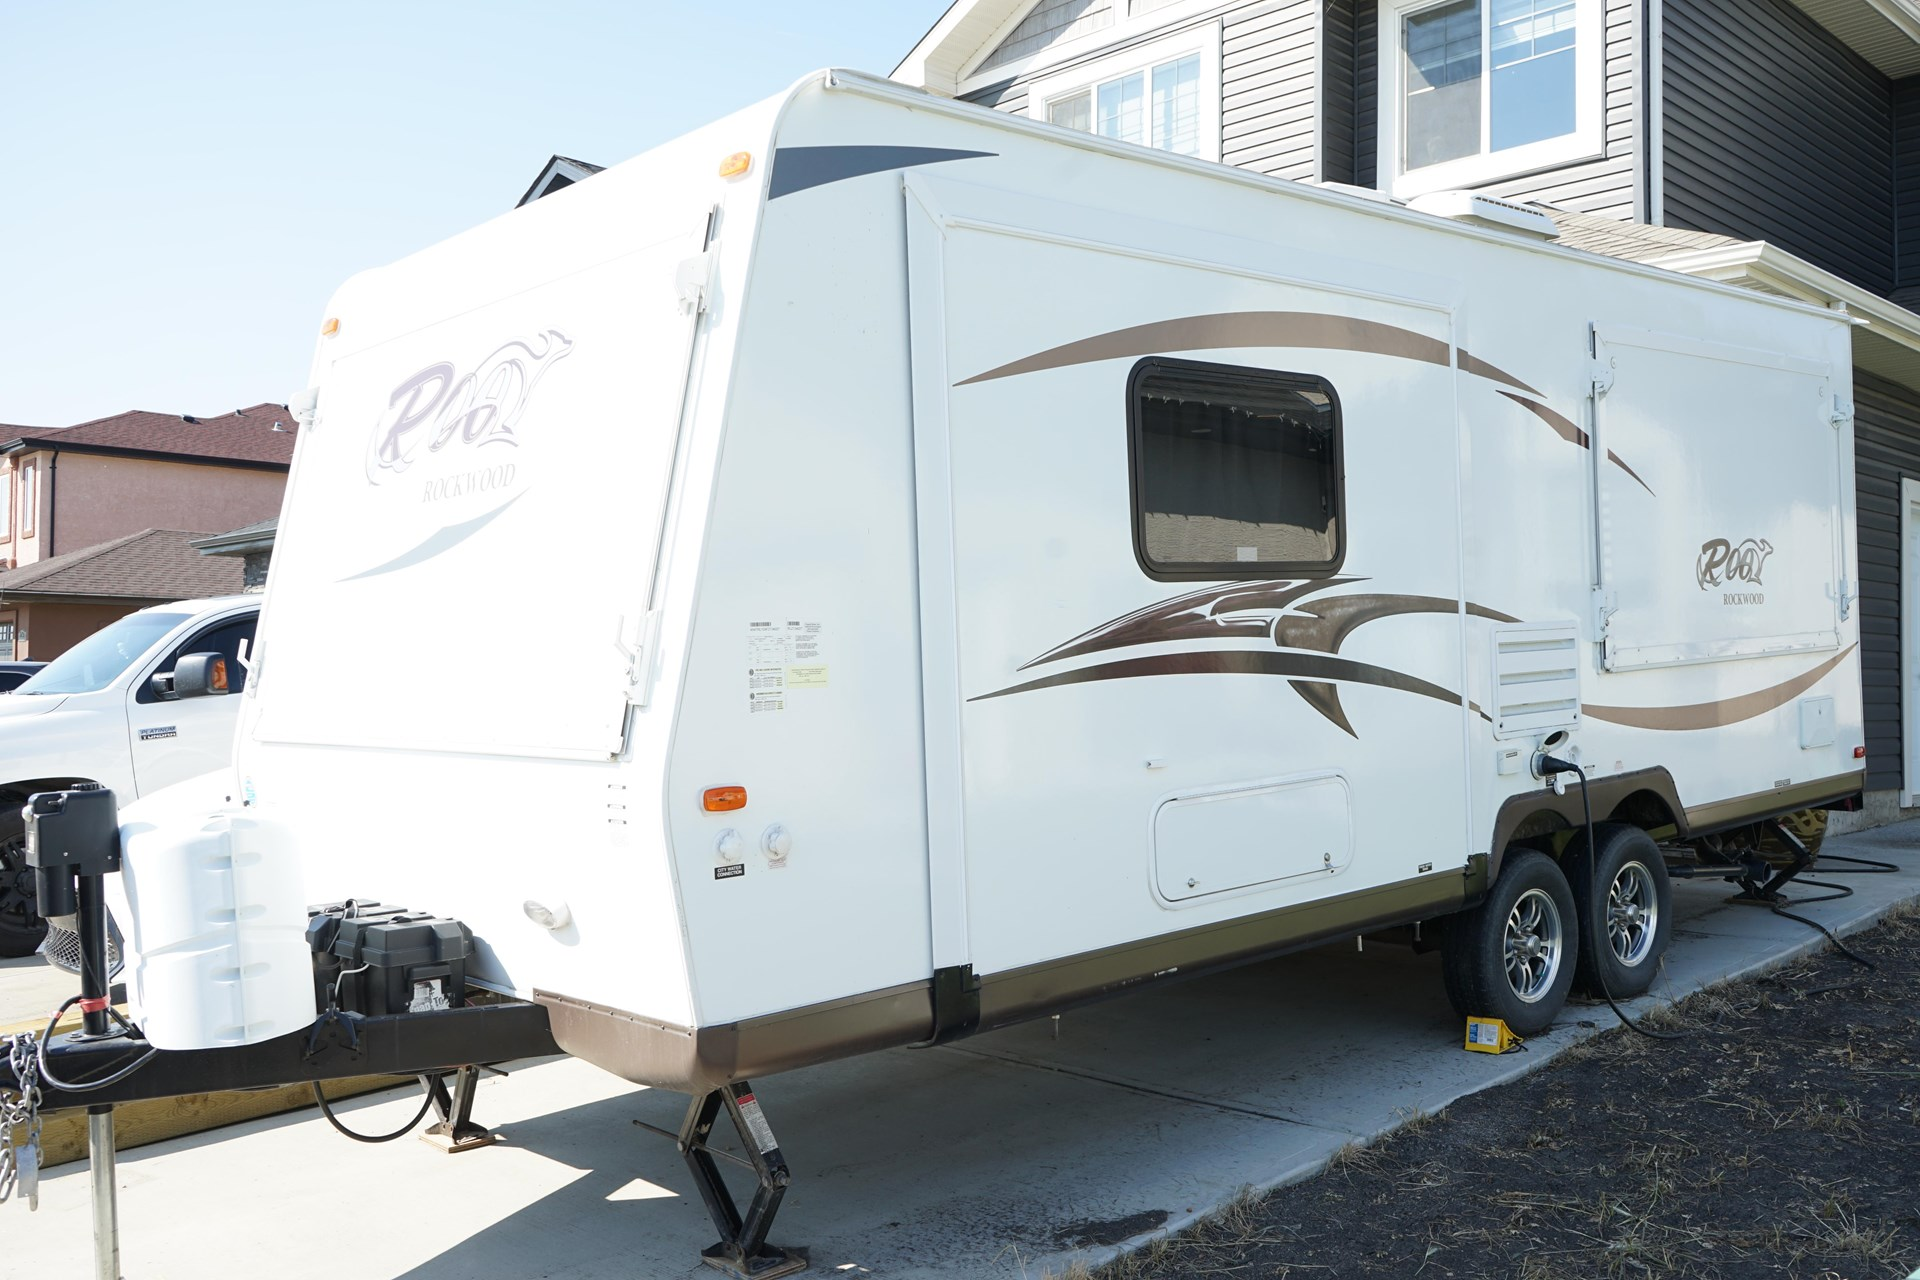 Rockwood Roo 233S Hybrid Travel Trailer - Edmonton, Alberta